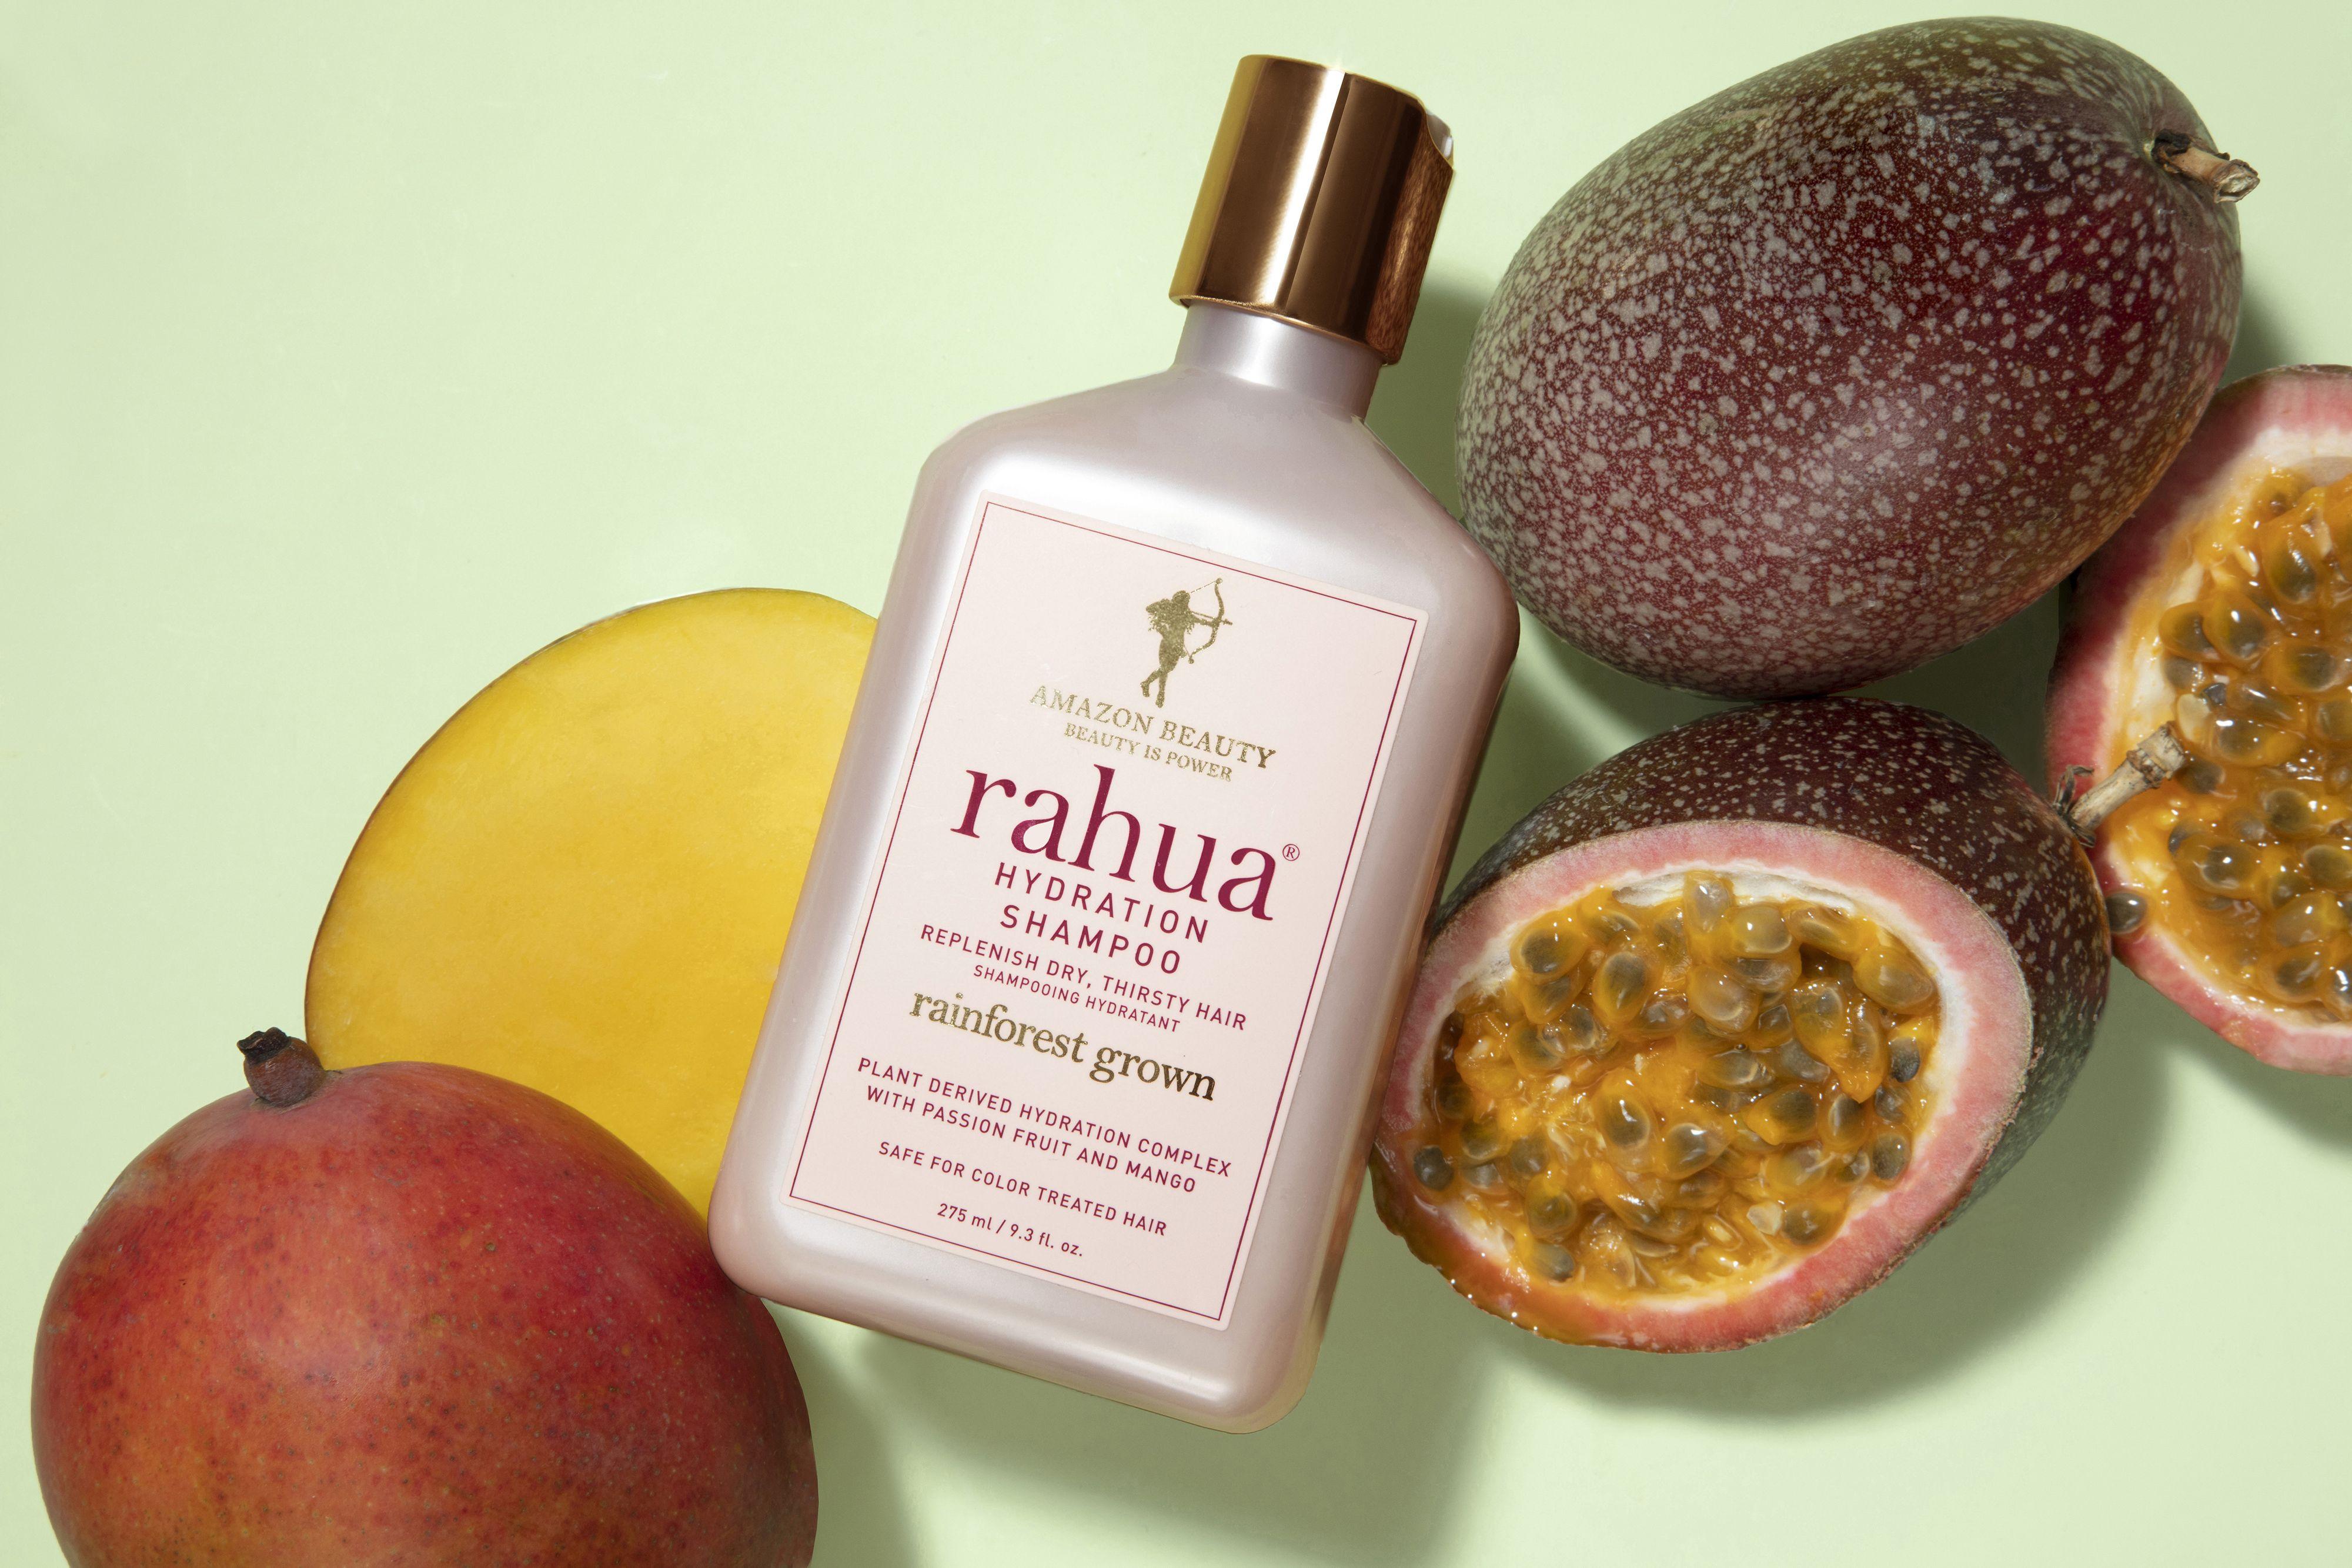 Hydration Shampoo 9.3 oz (With images) Rahua, Healthy